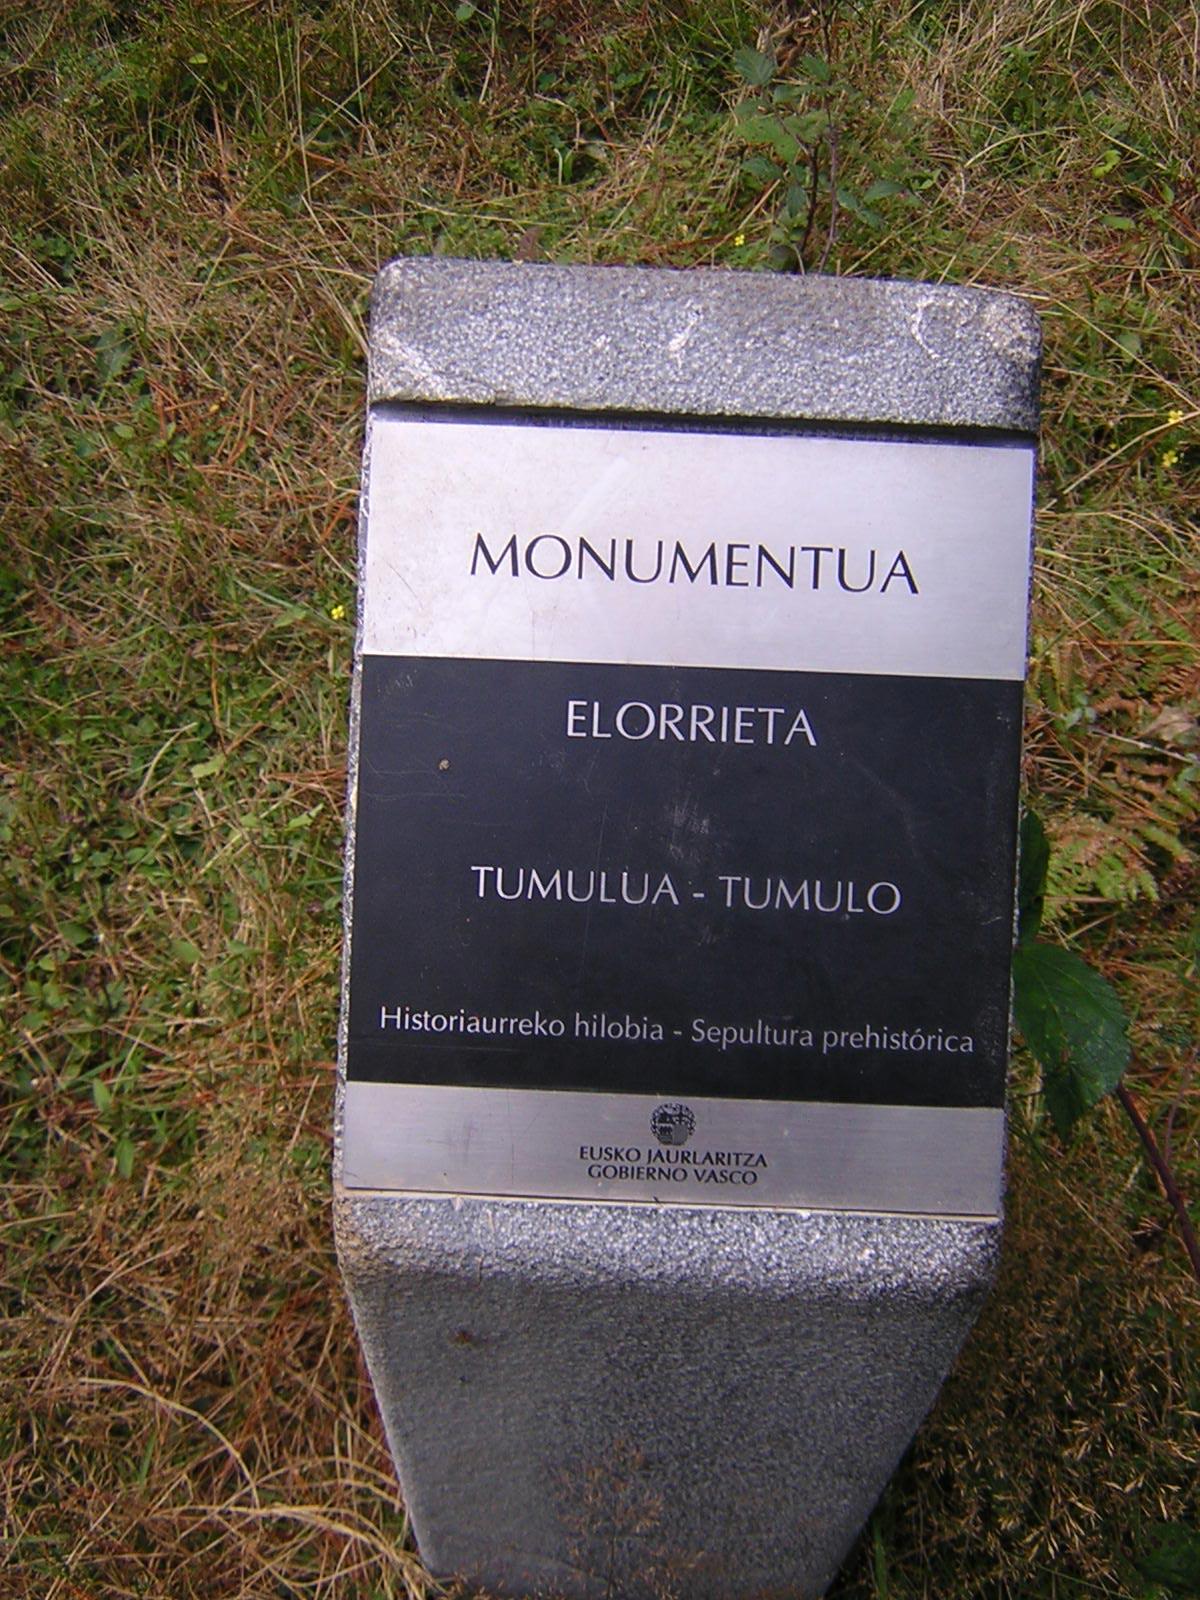 Túmulo Elorrieta Tumuloa